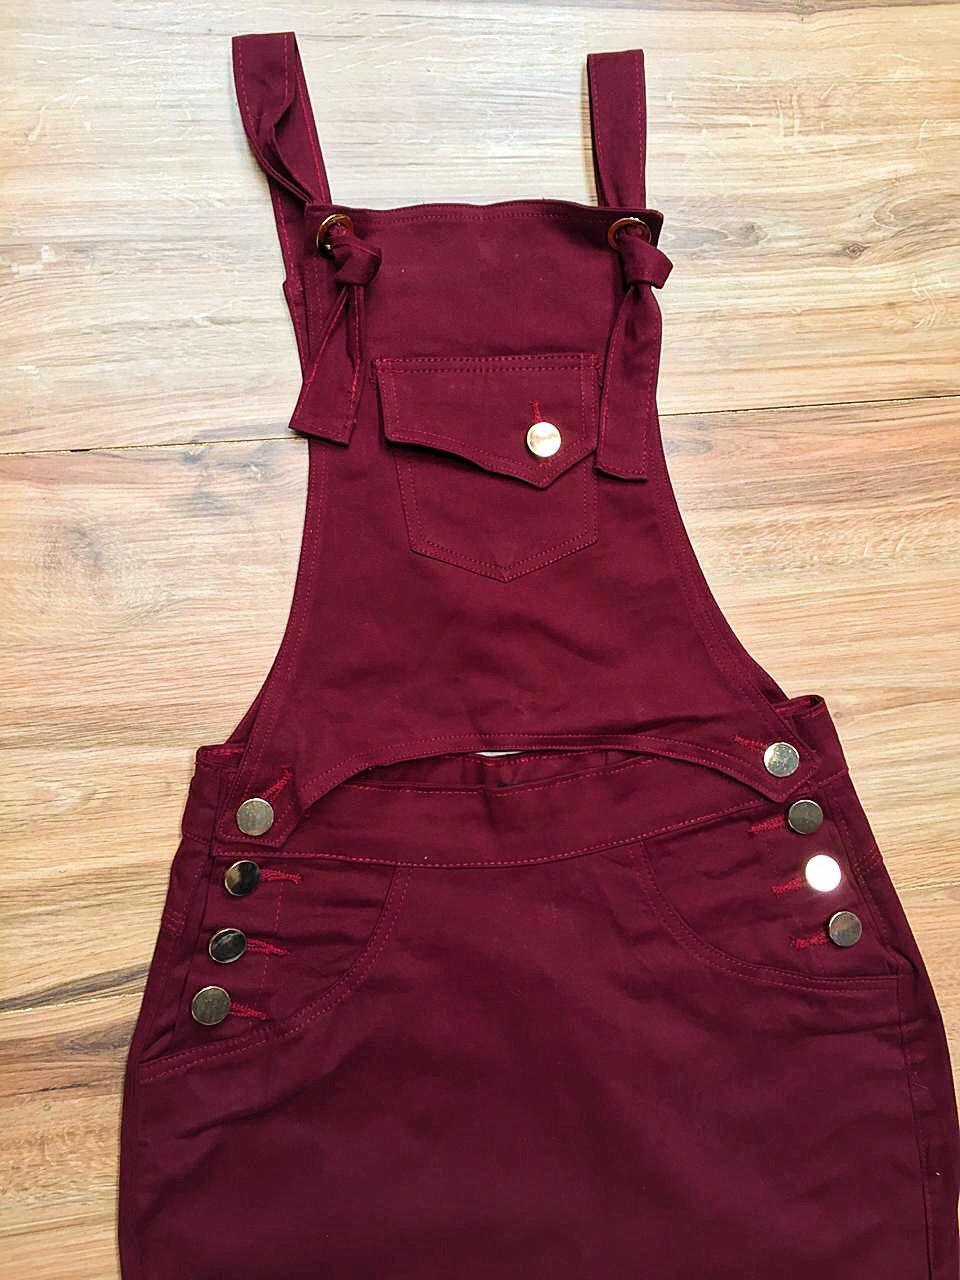 Salopete Jeans Coleção Primavera Saia Bella SB043 Marsala